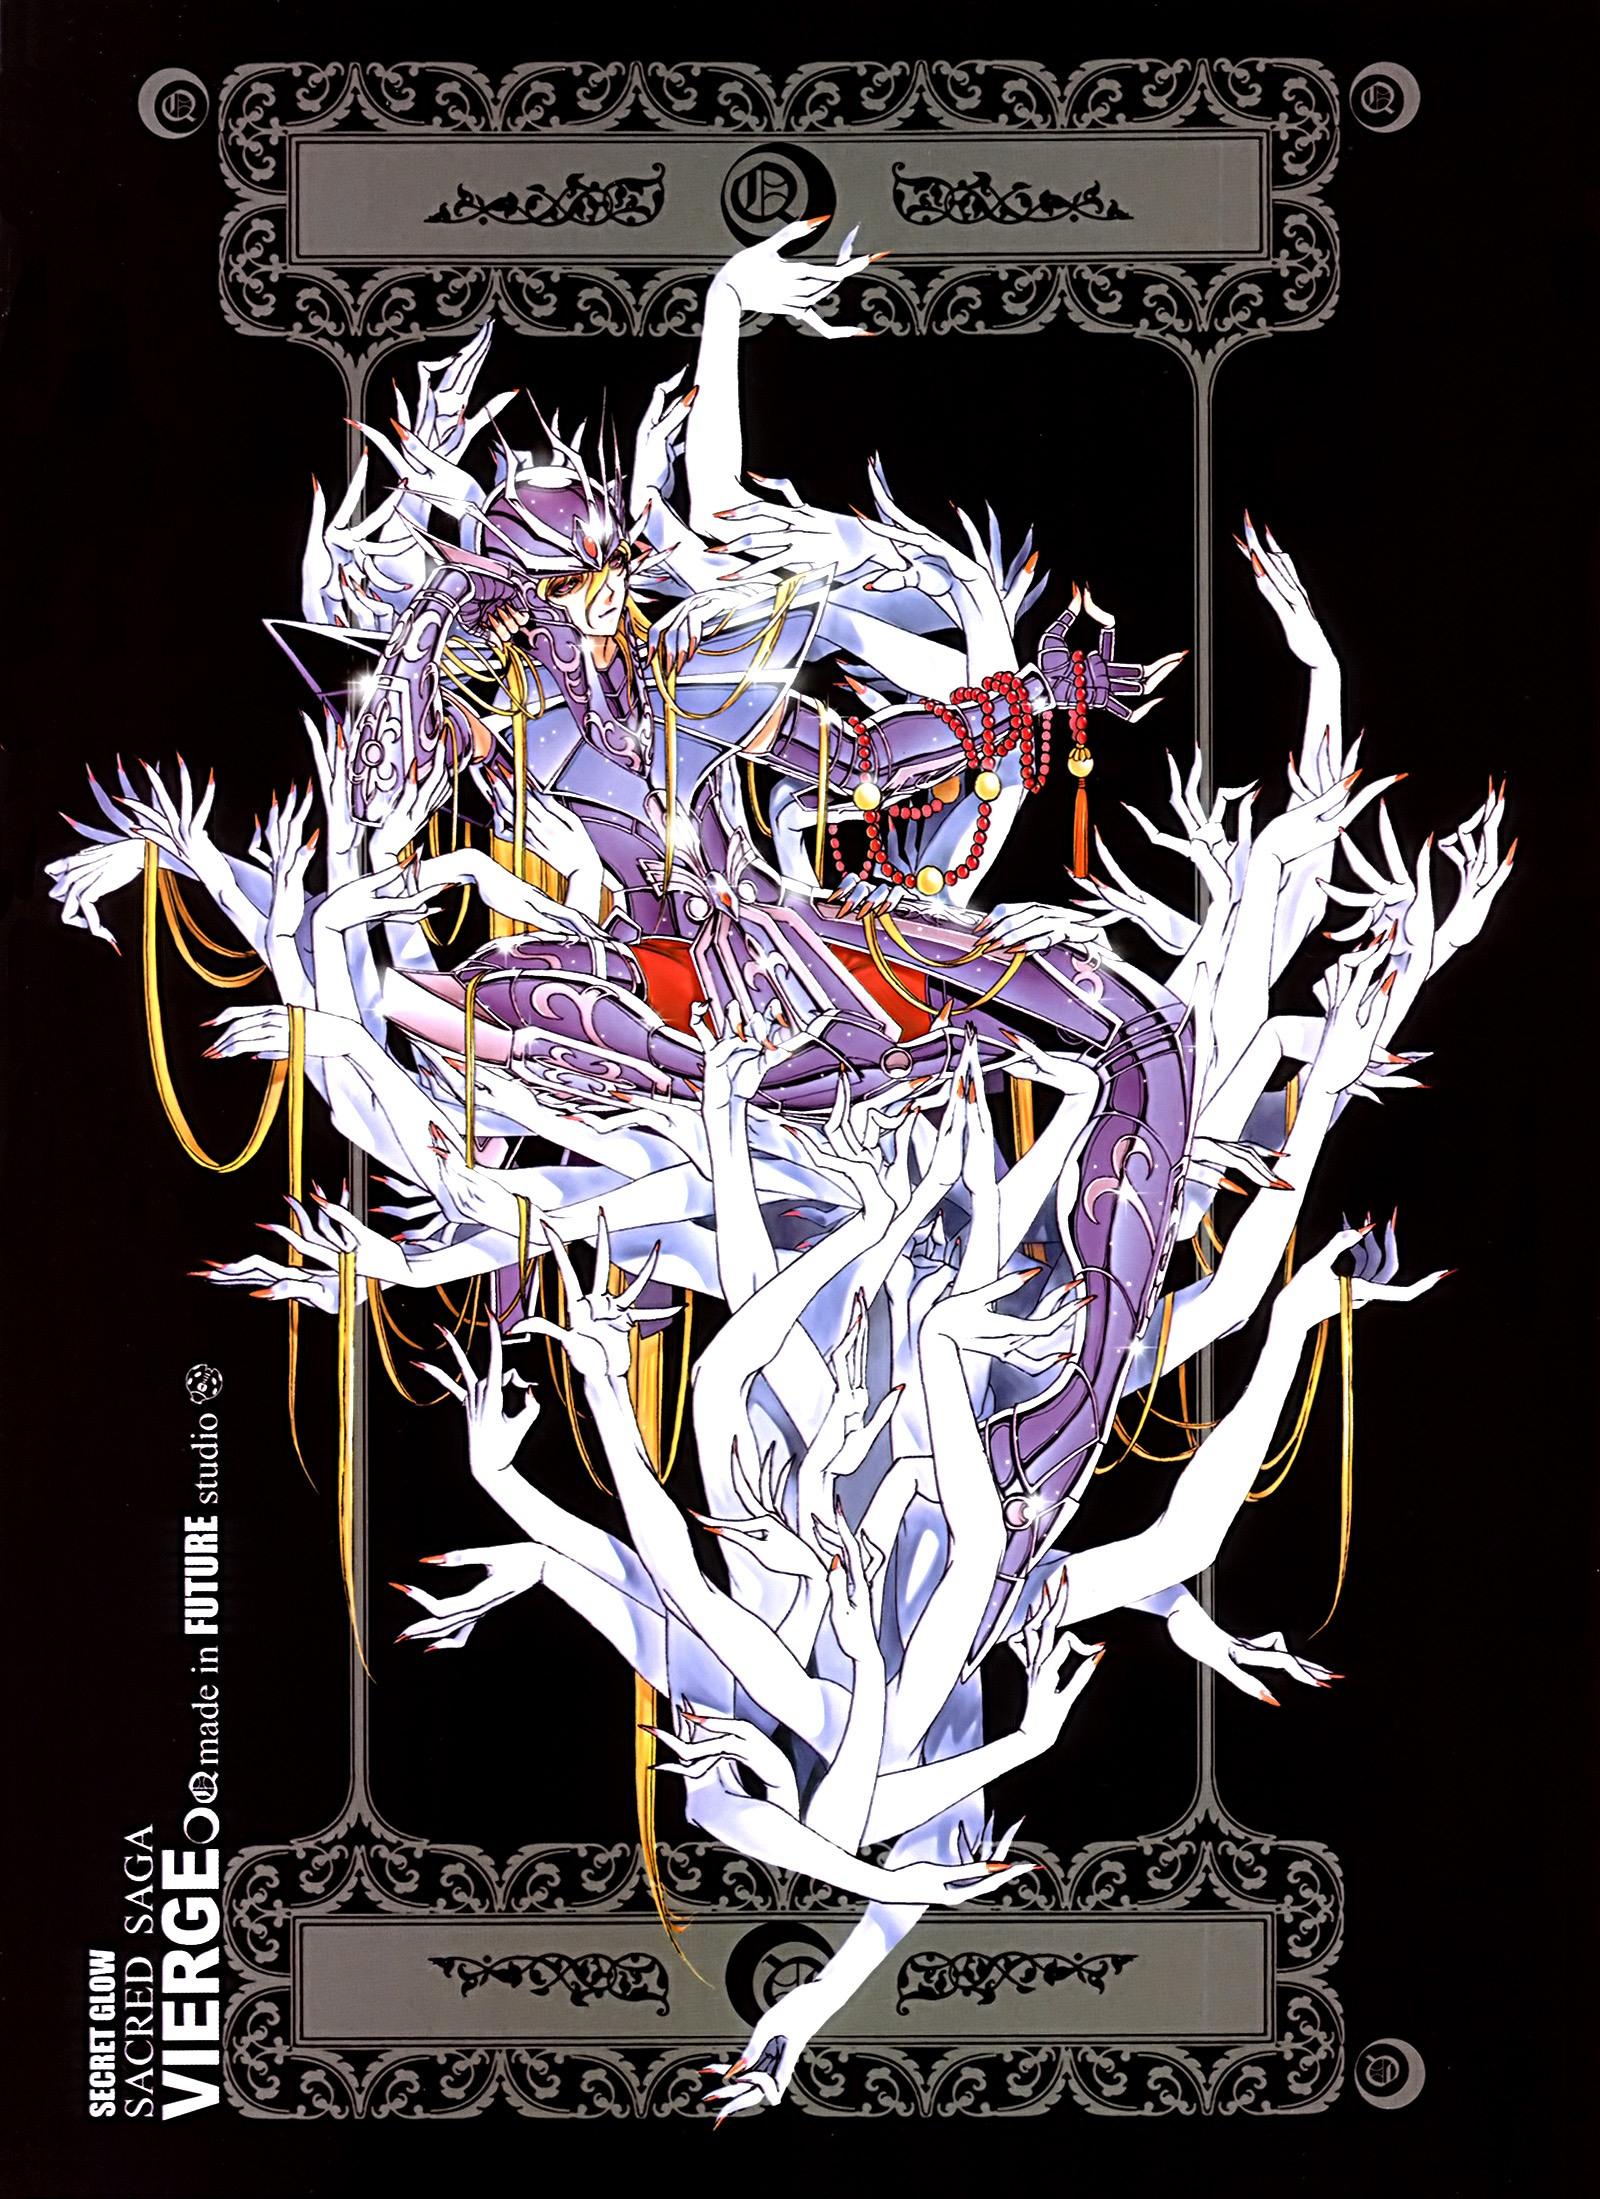 Virgo Shaka Saint Seiya Mobile Wallpaper 631643 Zerochan Anime Image Board